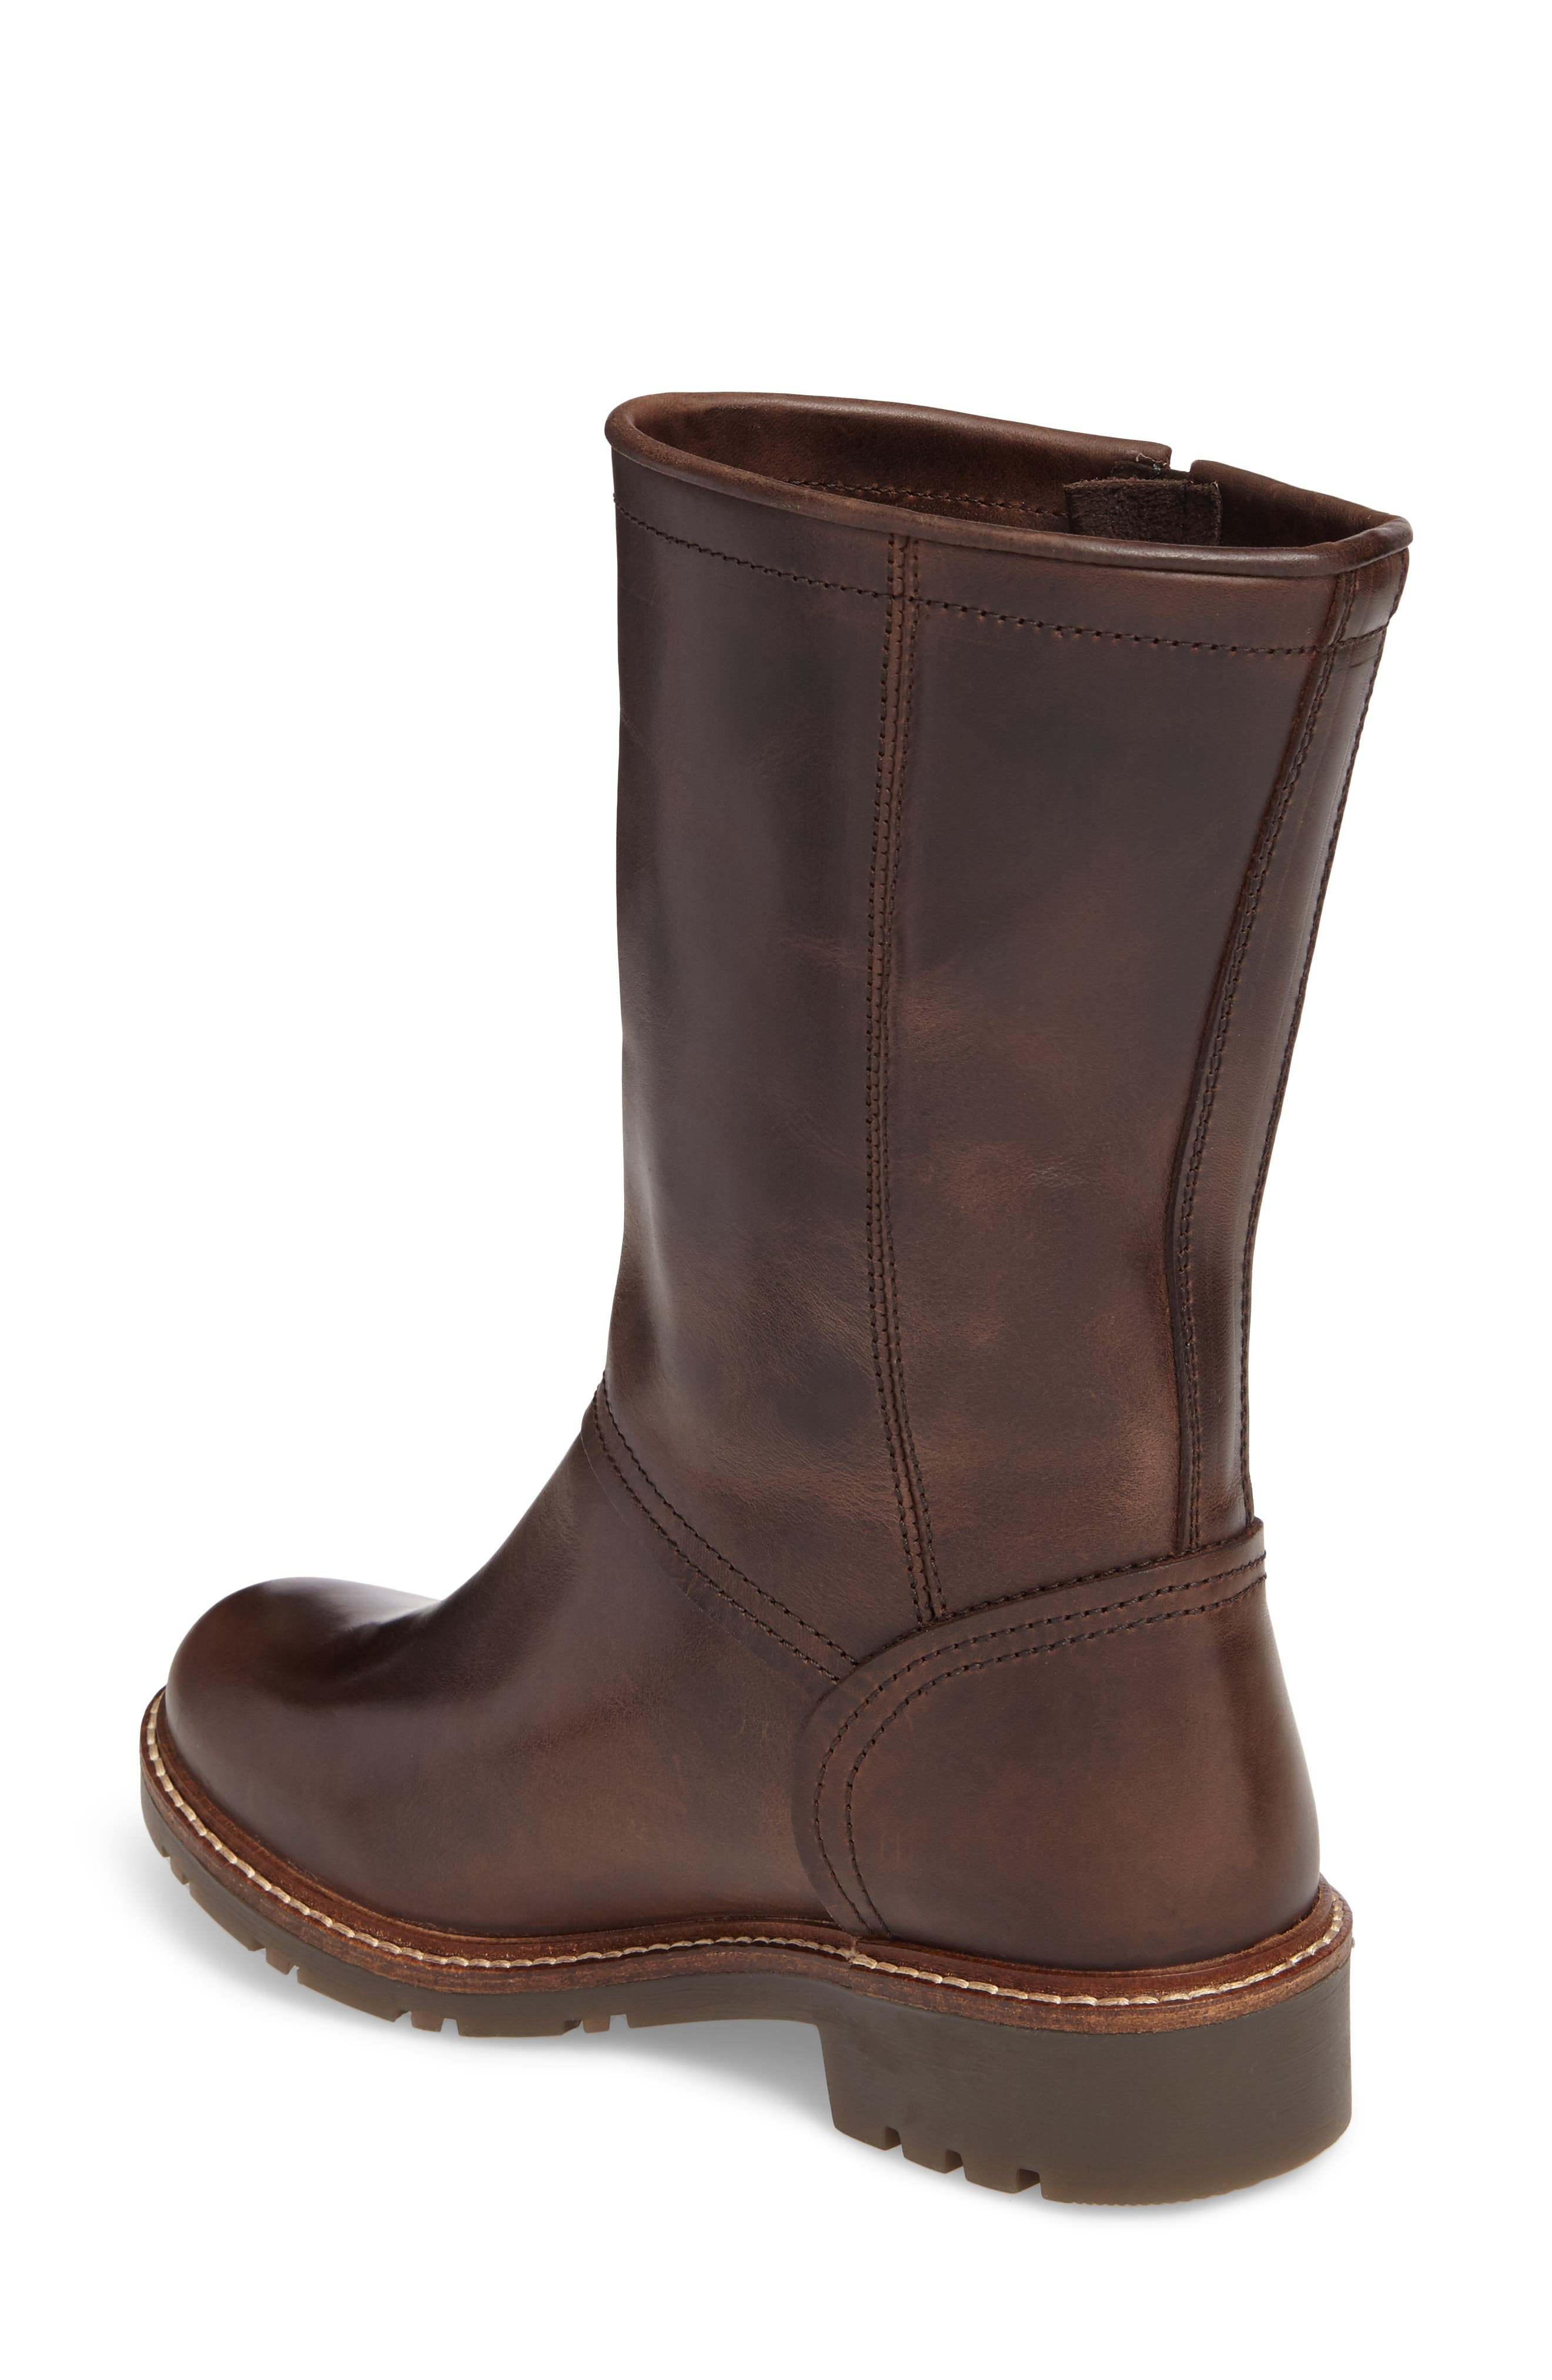 Sasi Waterproof Gore-Tex<sup>®</sup> Boot,                             Alternate thumbnail 2, color,                             Dark Brown Rug Leather